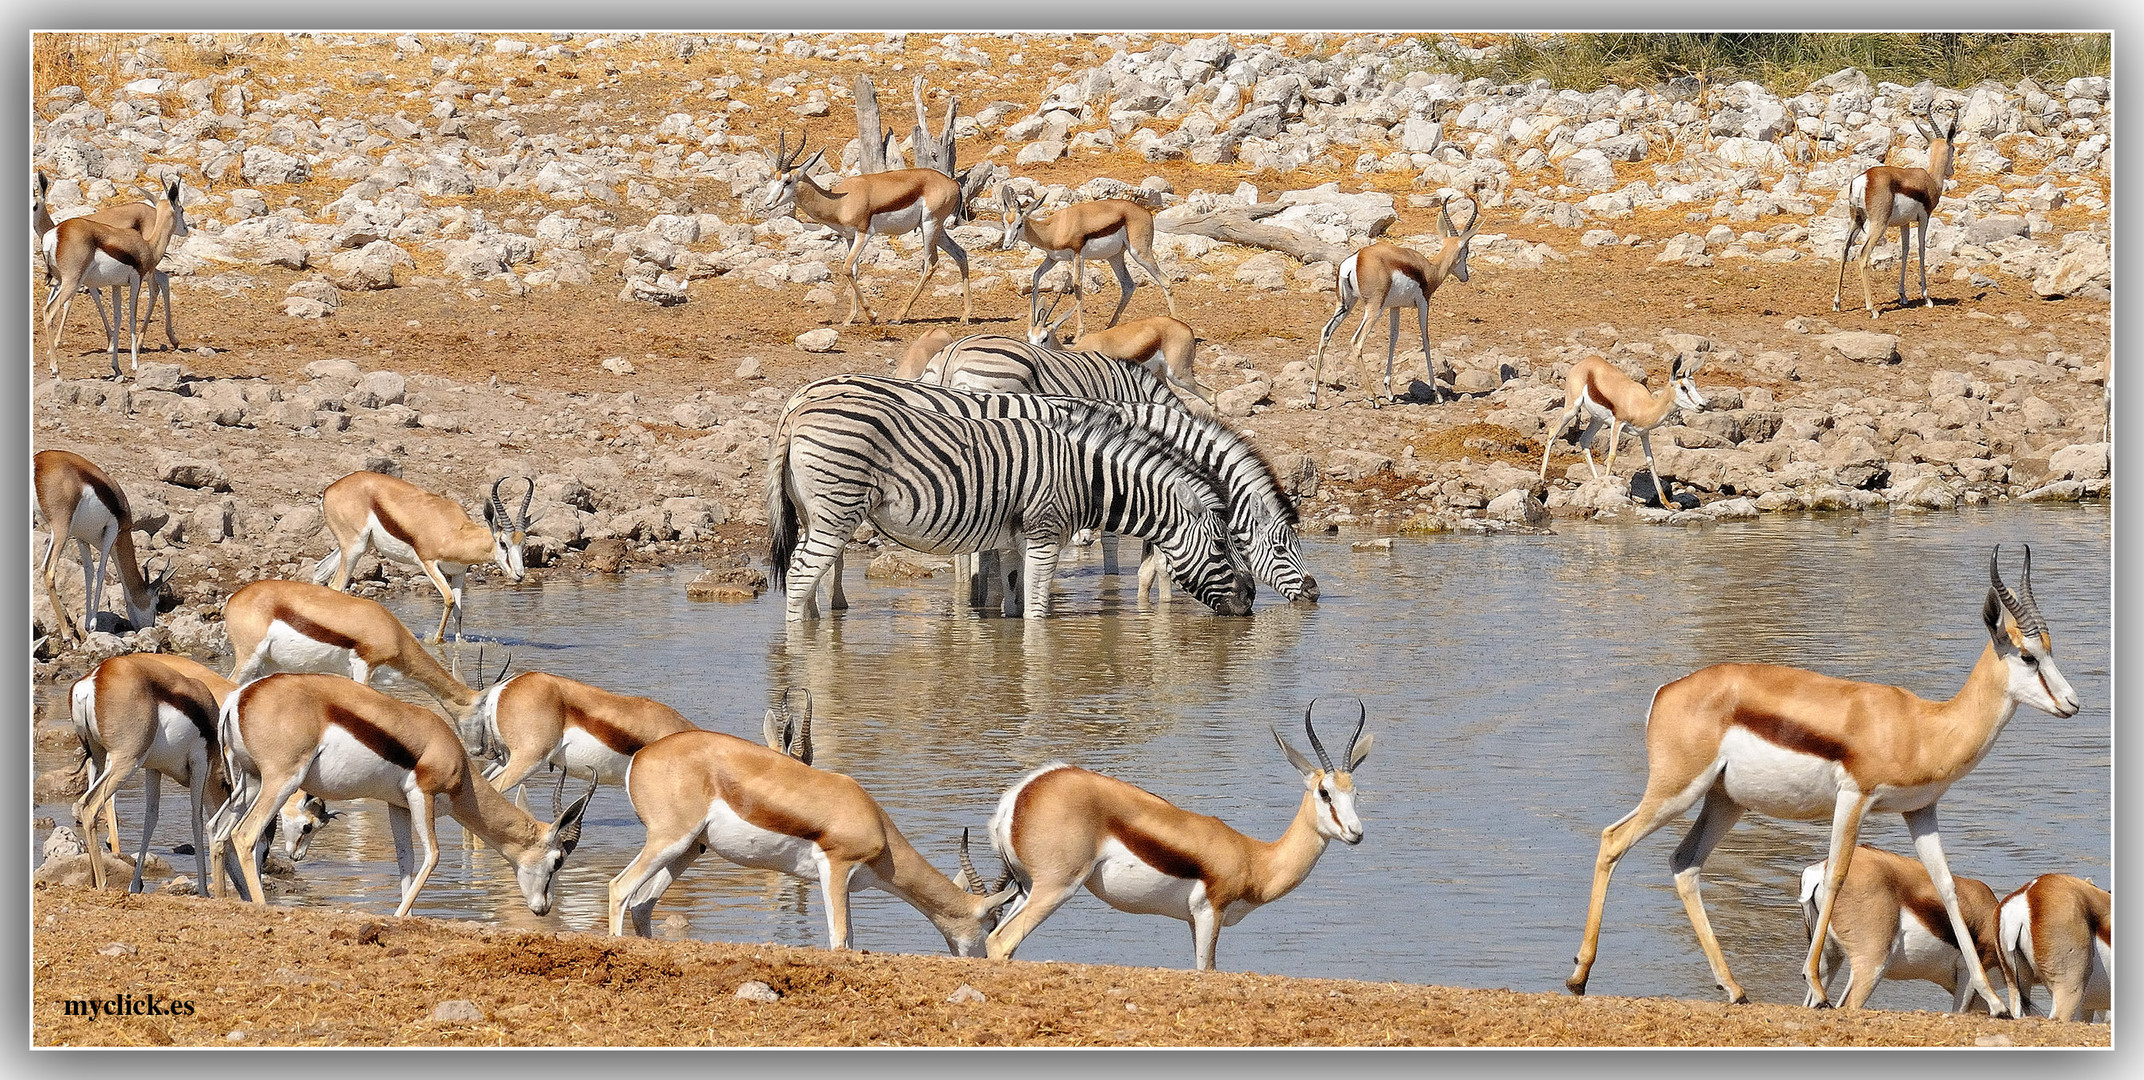 MEMORIAS DE AFRICA-LAS CHARCAS -PN ETHOSA NAMIBIA